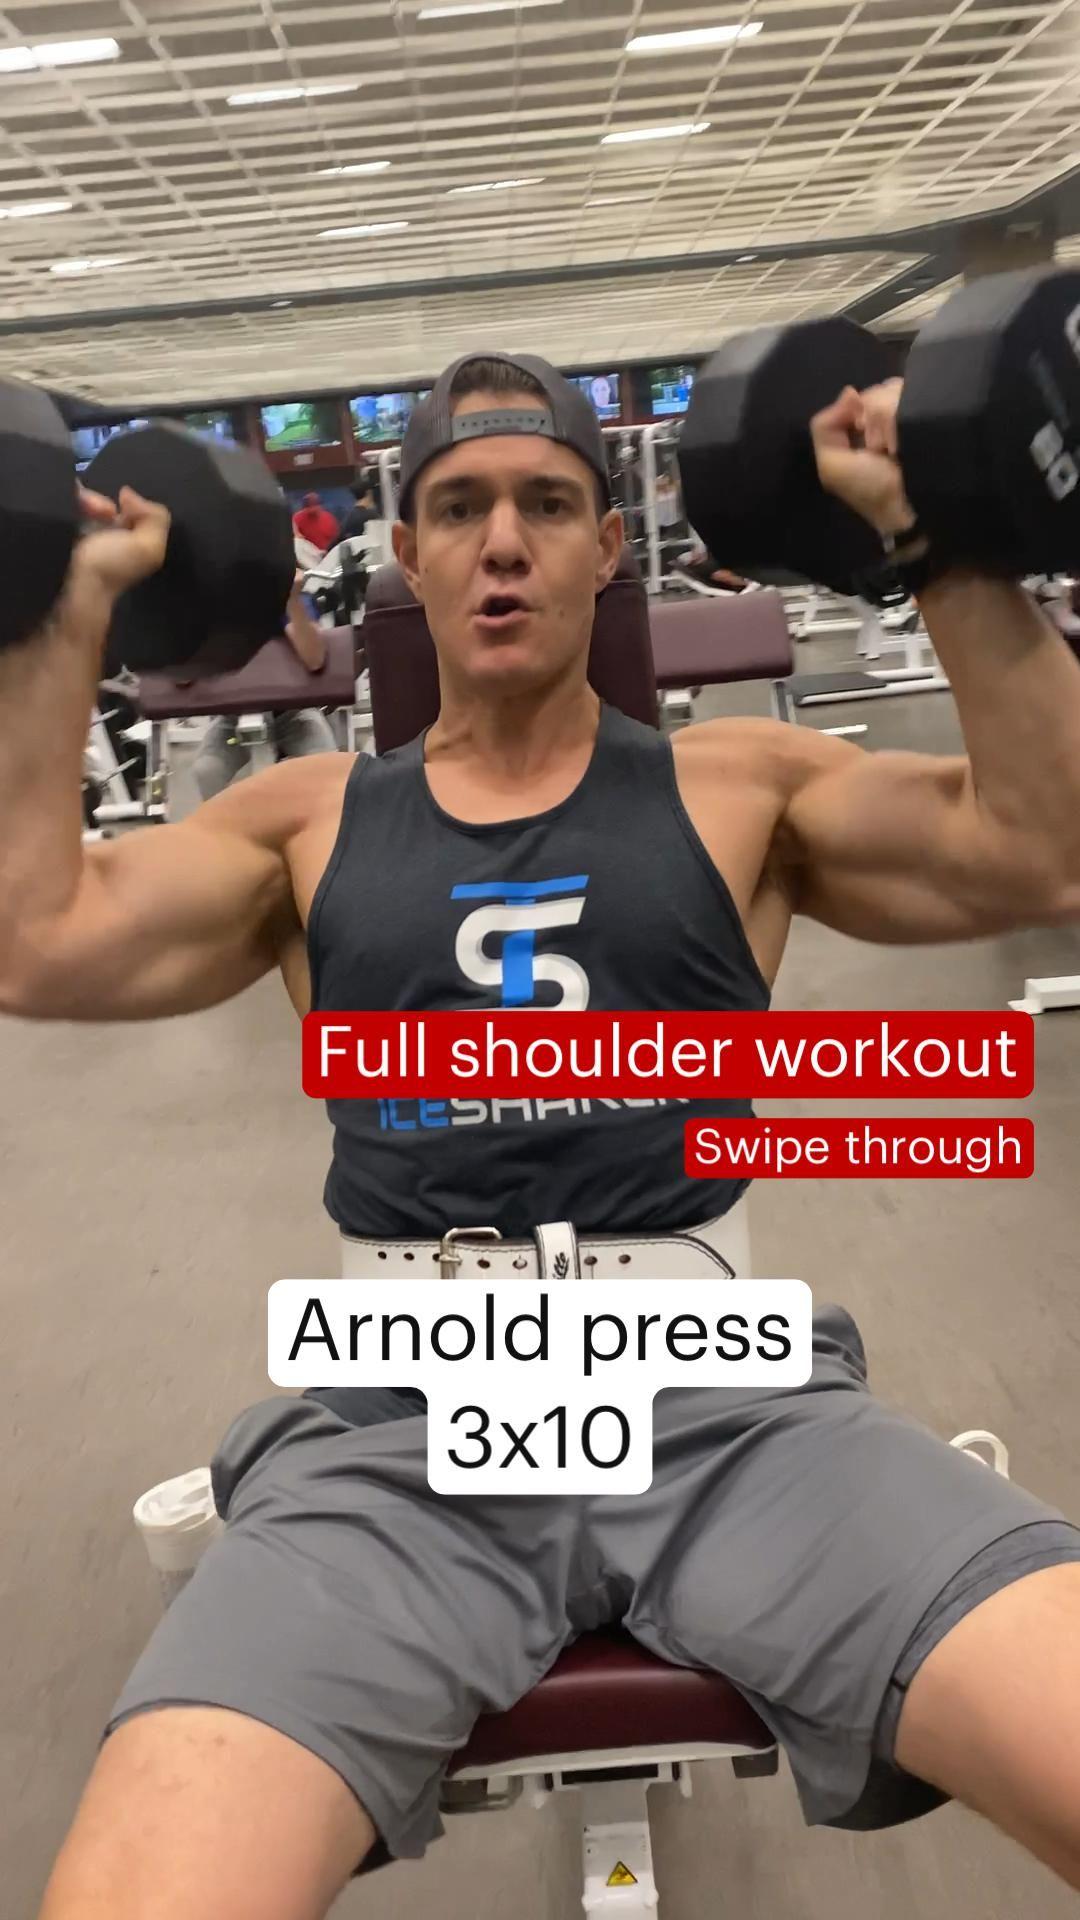 Full shoulder workout at the gym.